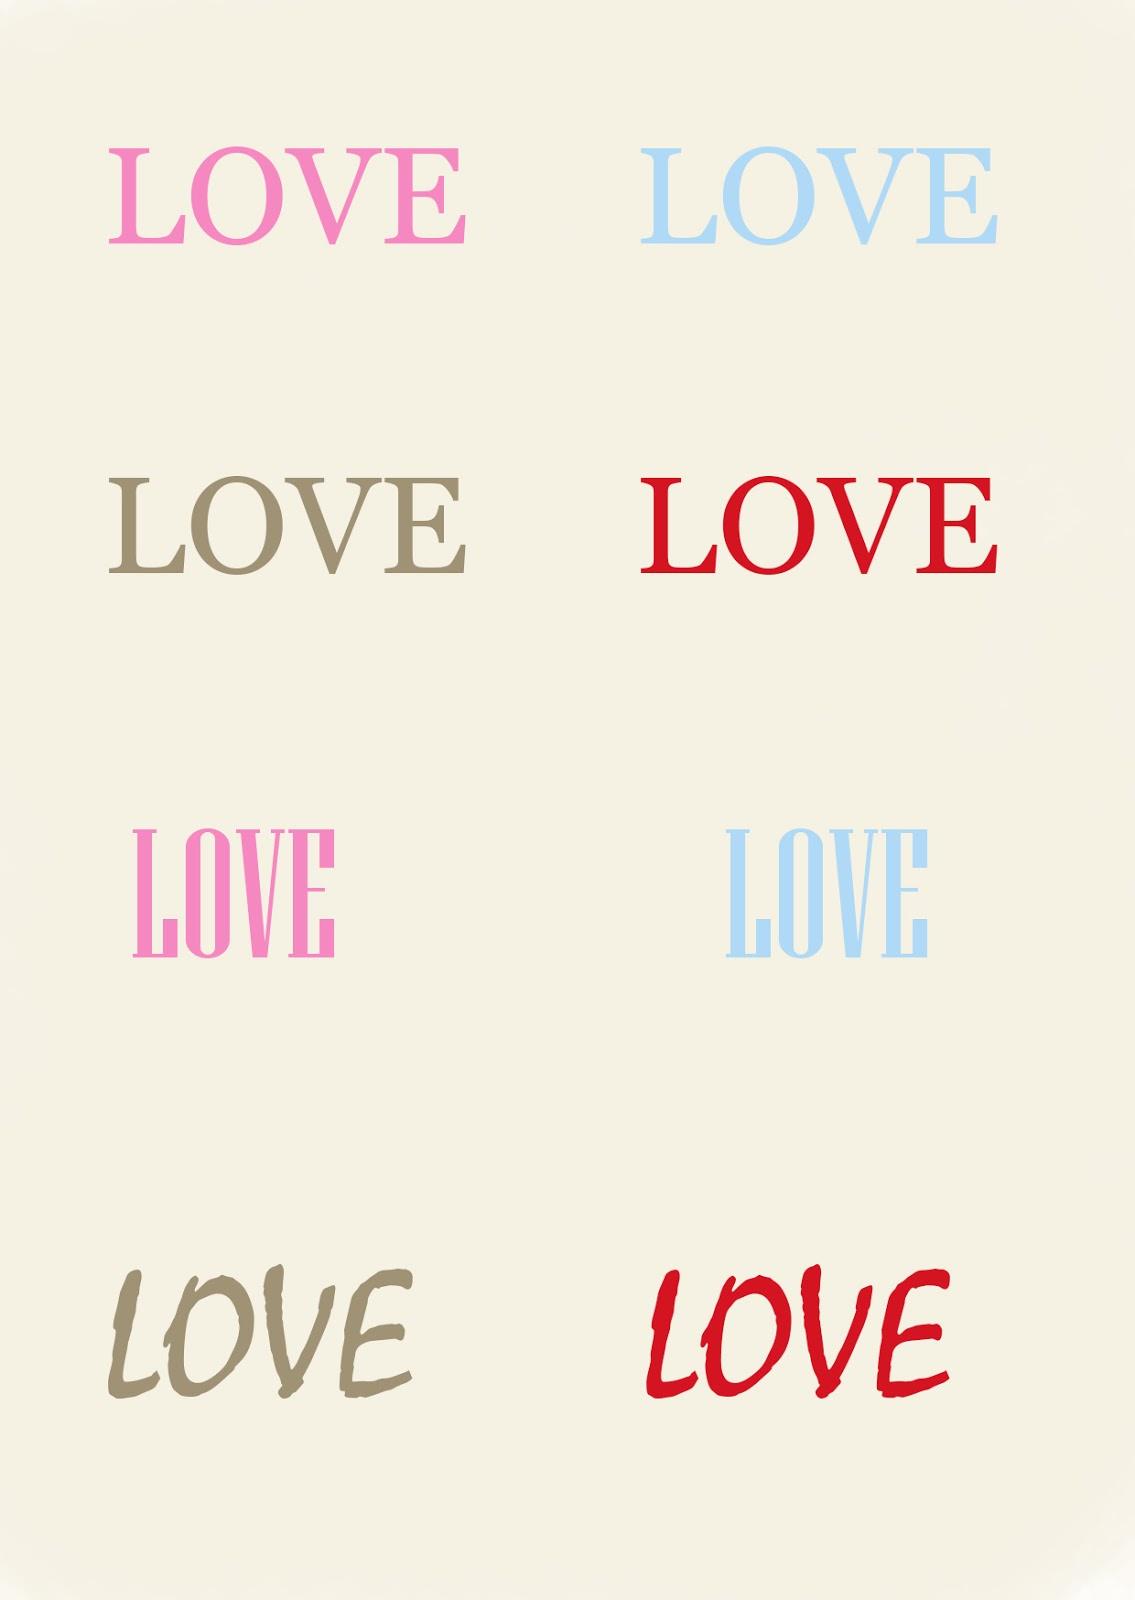 картинки про любовь с надписями - Картинки про любовь с надписями